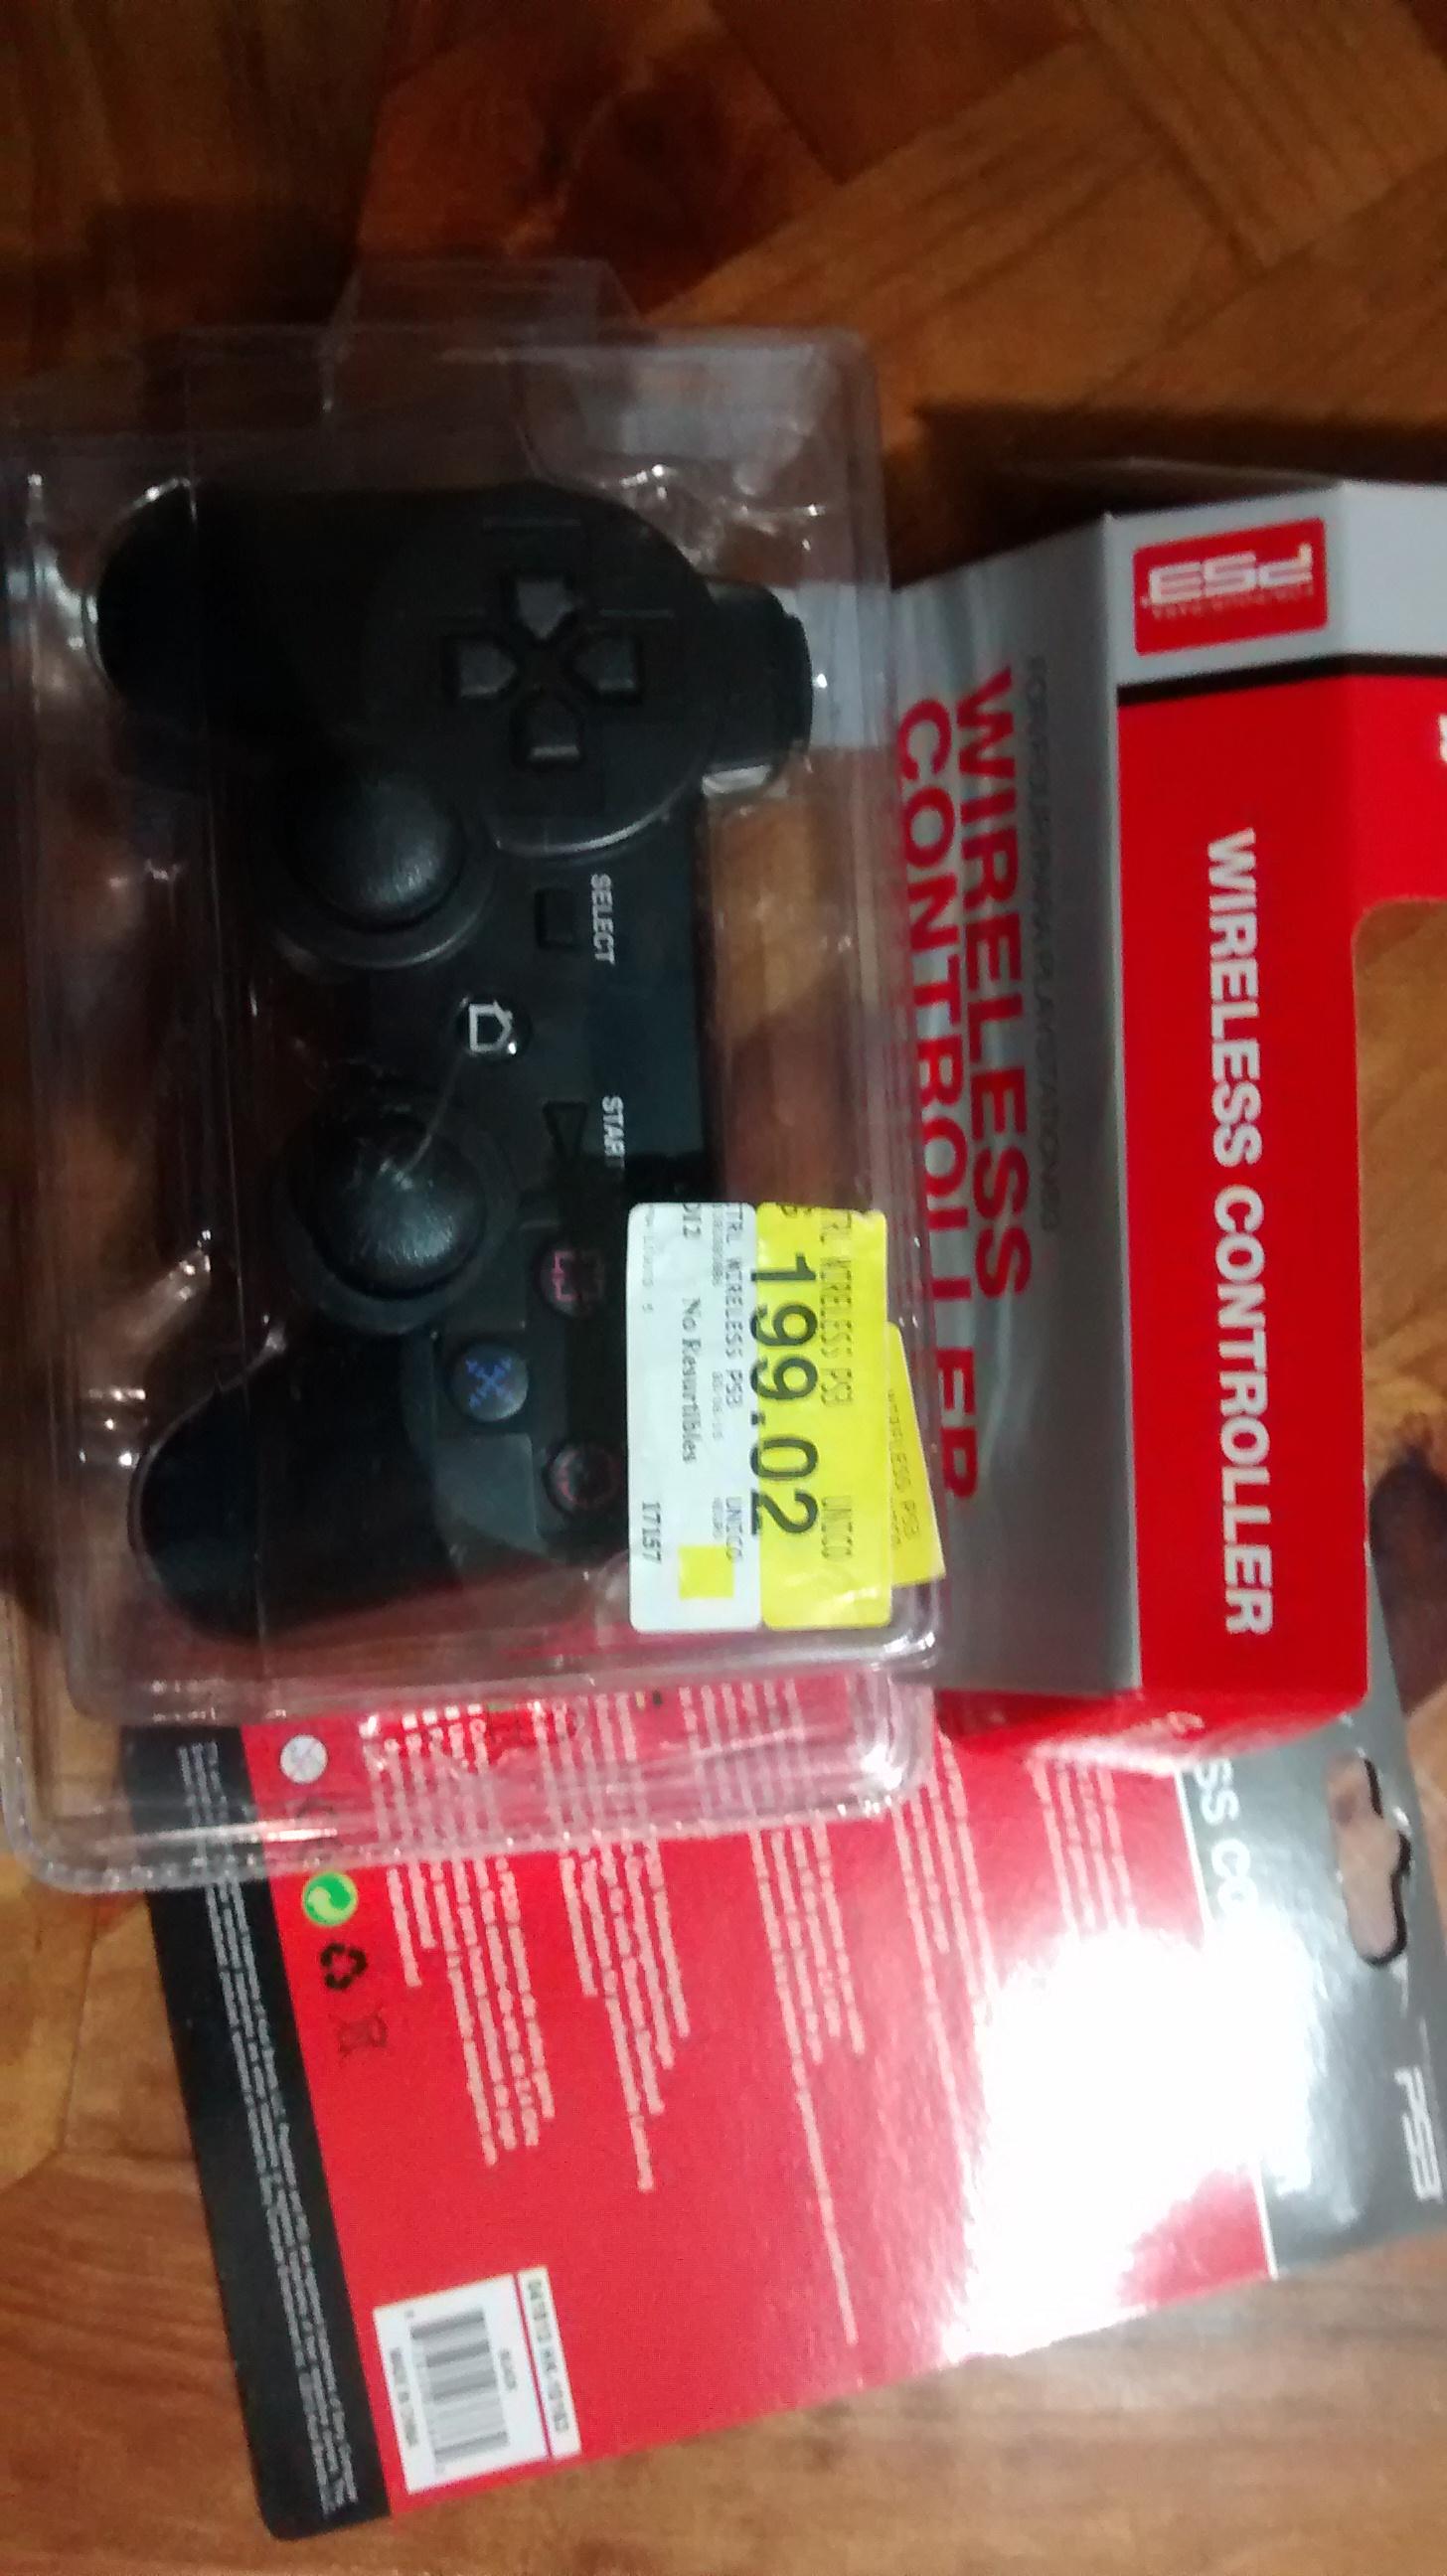 Walmart: Control Genérico Inalámbrico para Ps3 a 199.02